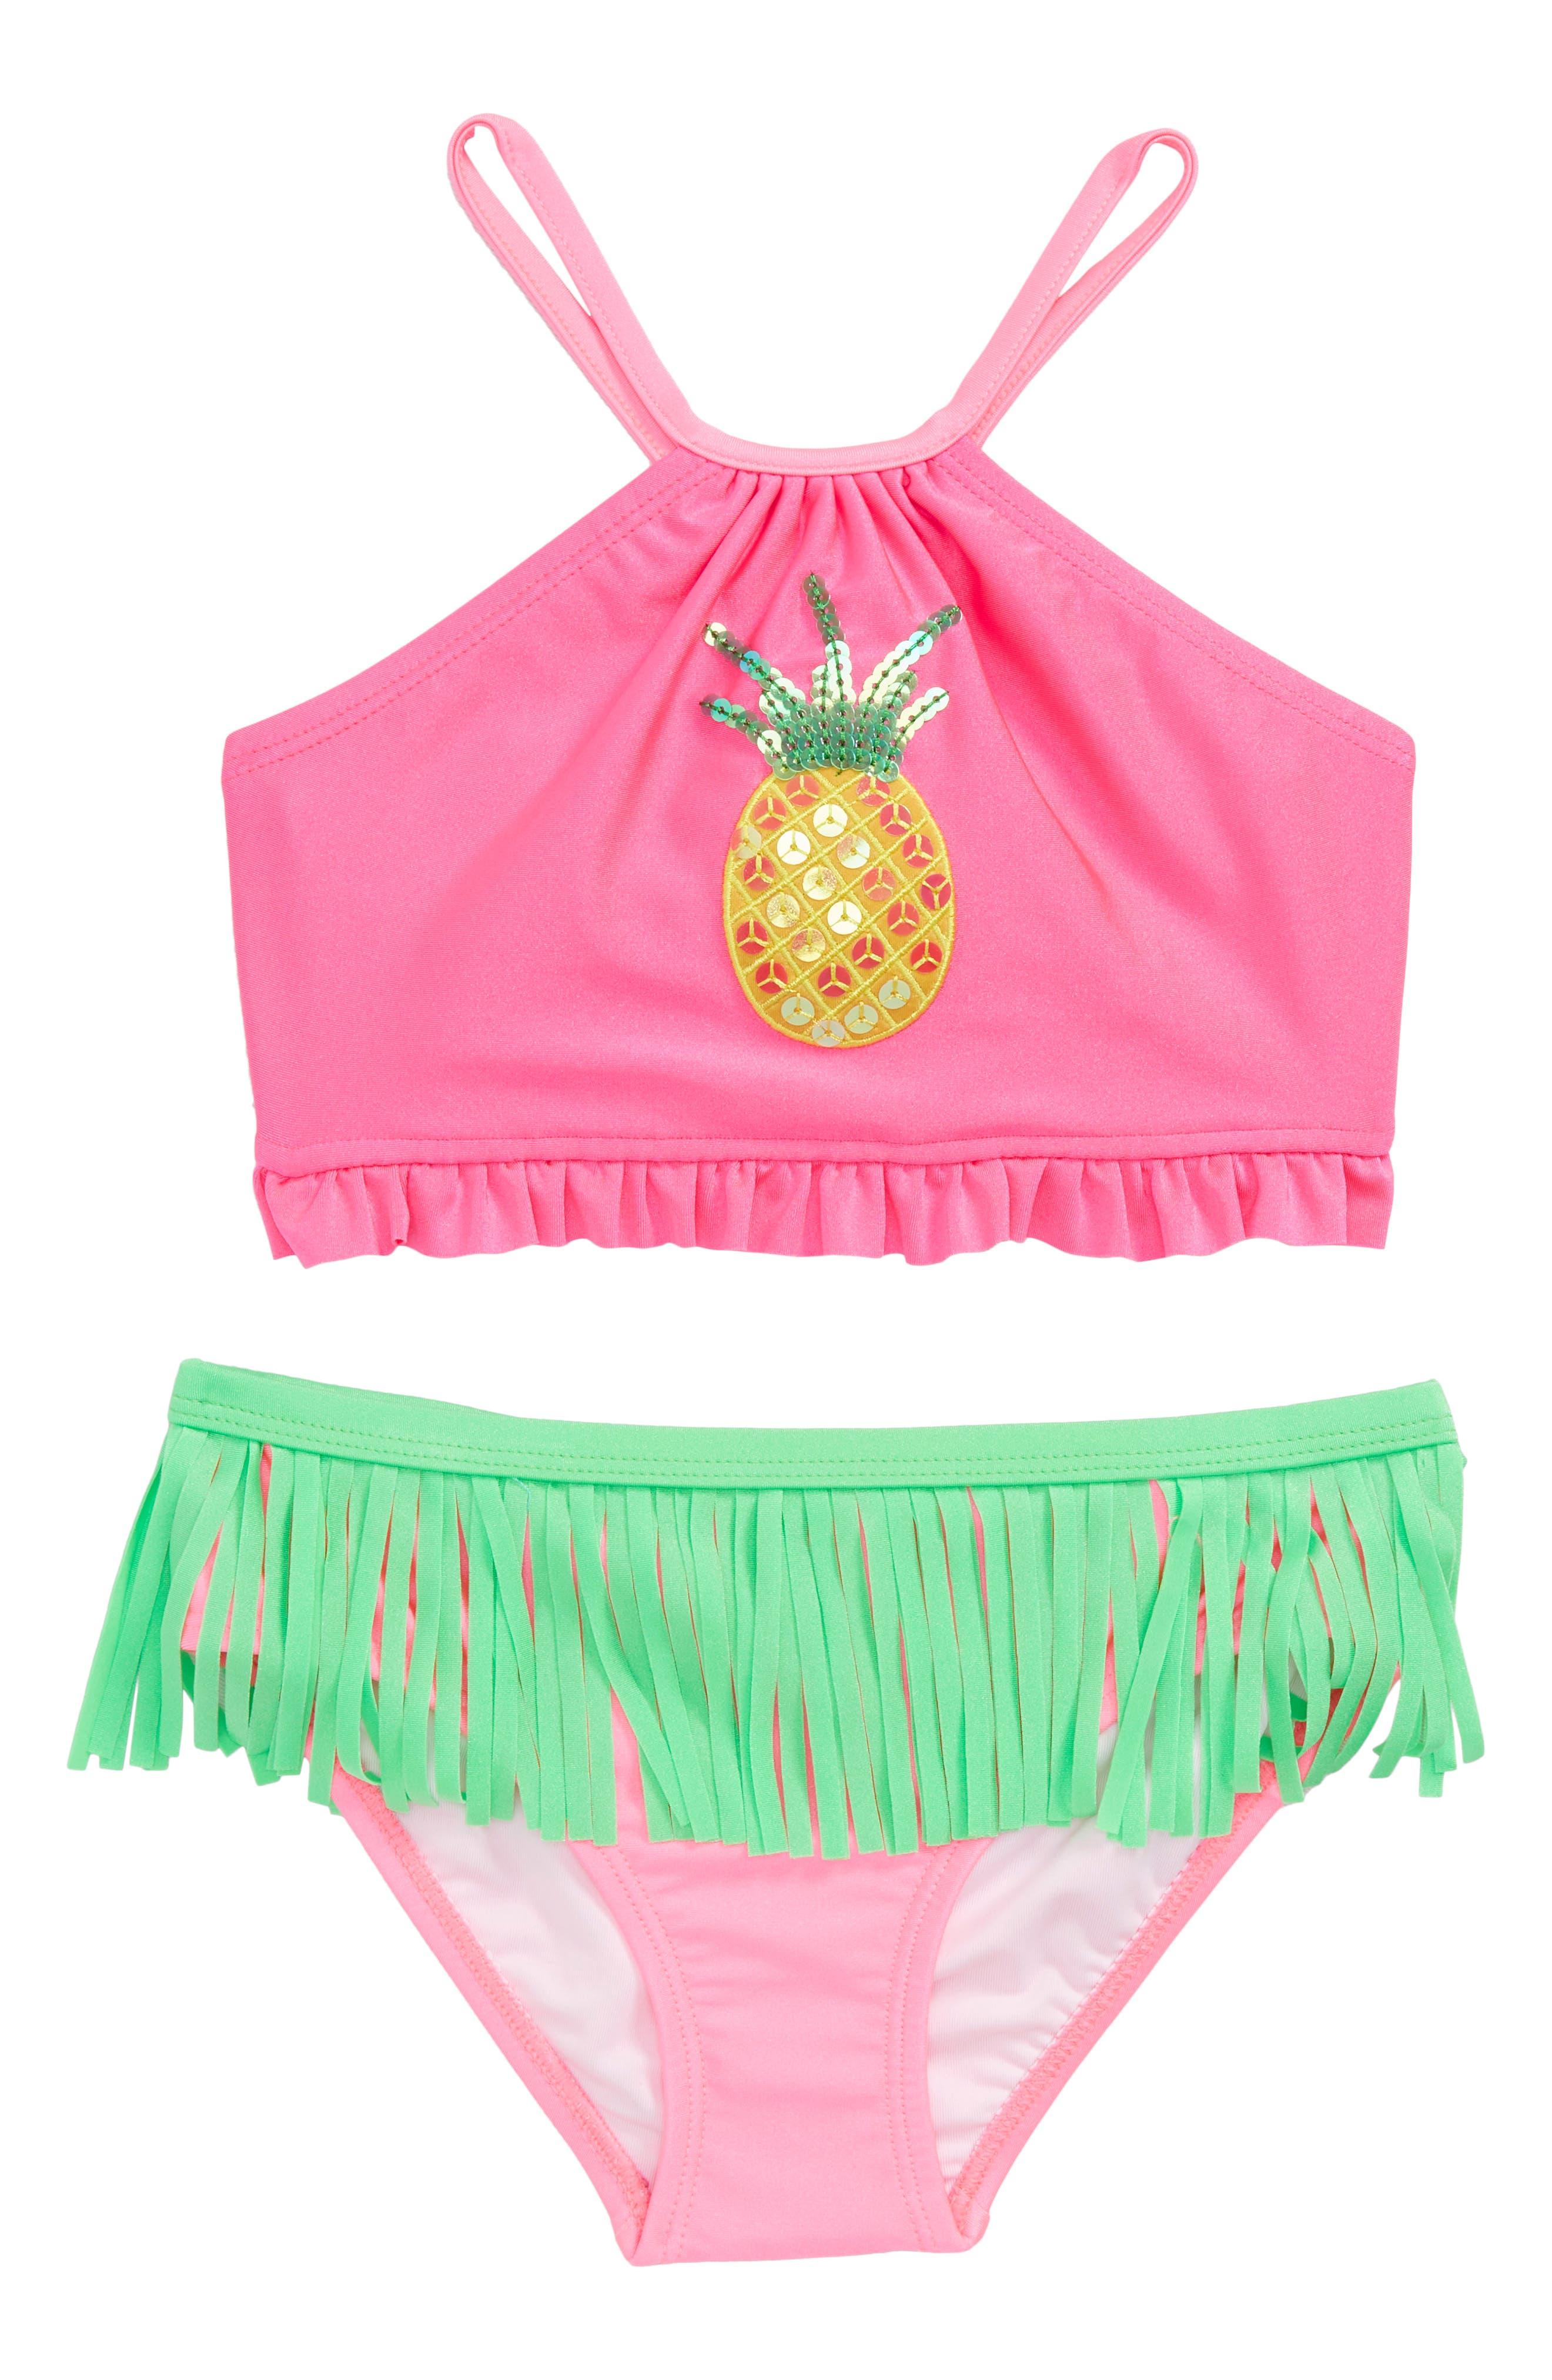 Main Image - Love U Lots Pineapple Hula Two-Piece Bikini Swimsuit (Toddler Girls & Little Girls)